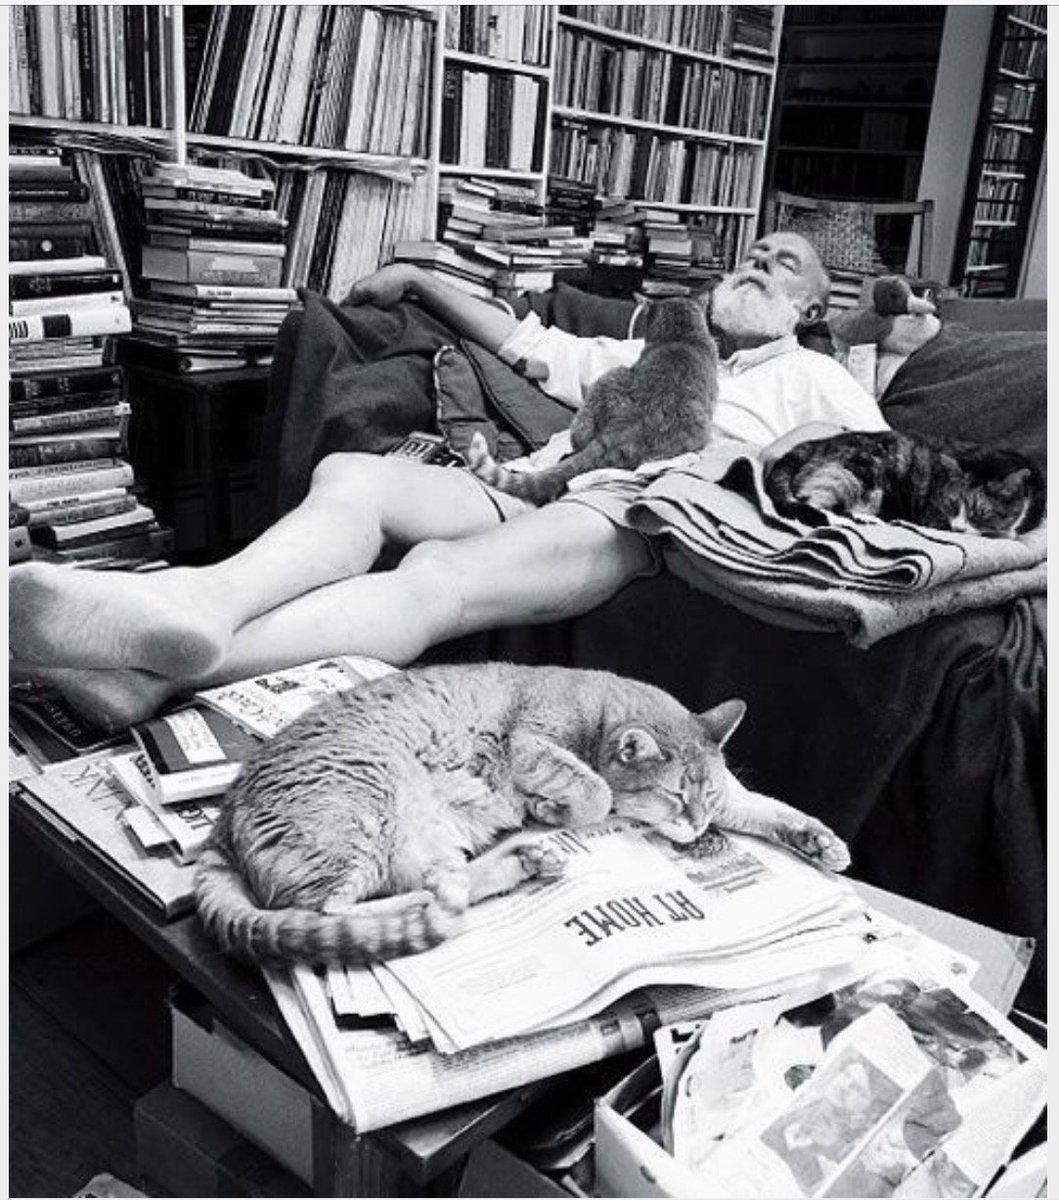 All hail Edward Gorey, the patron saint of cats. #NationalCatDay #ArtistsandTheirCats <br>http://pic.twitter.com/ZrGDi4ThNQ